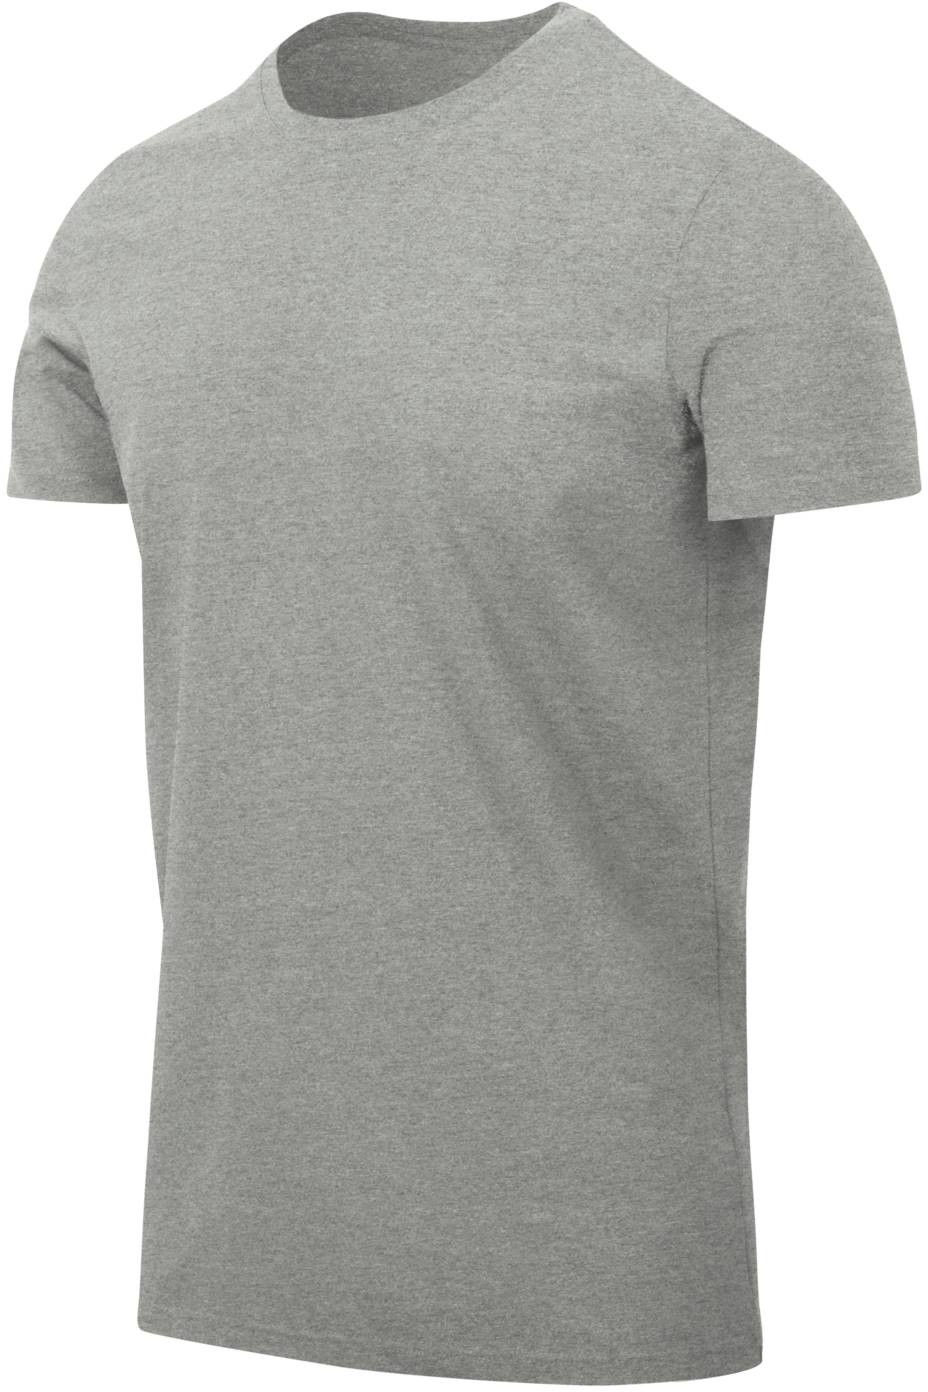 Koszulka T-Shirt Helikon Slim Melange Grey (TS-TSS-CC-M3) H